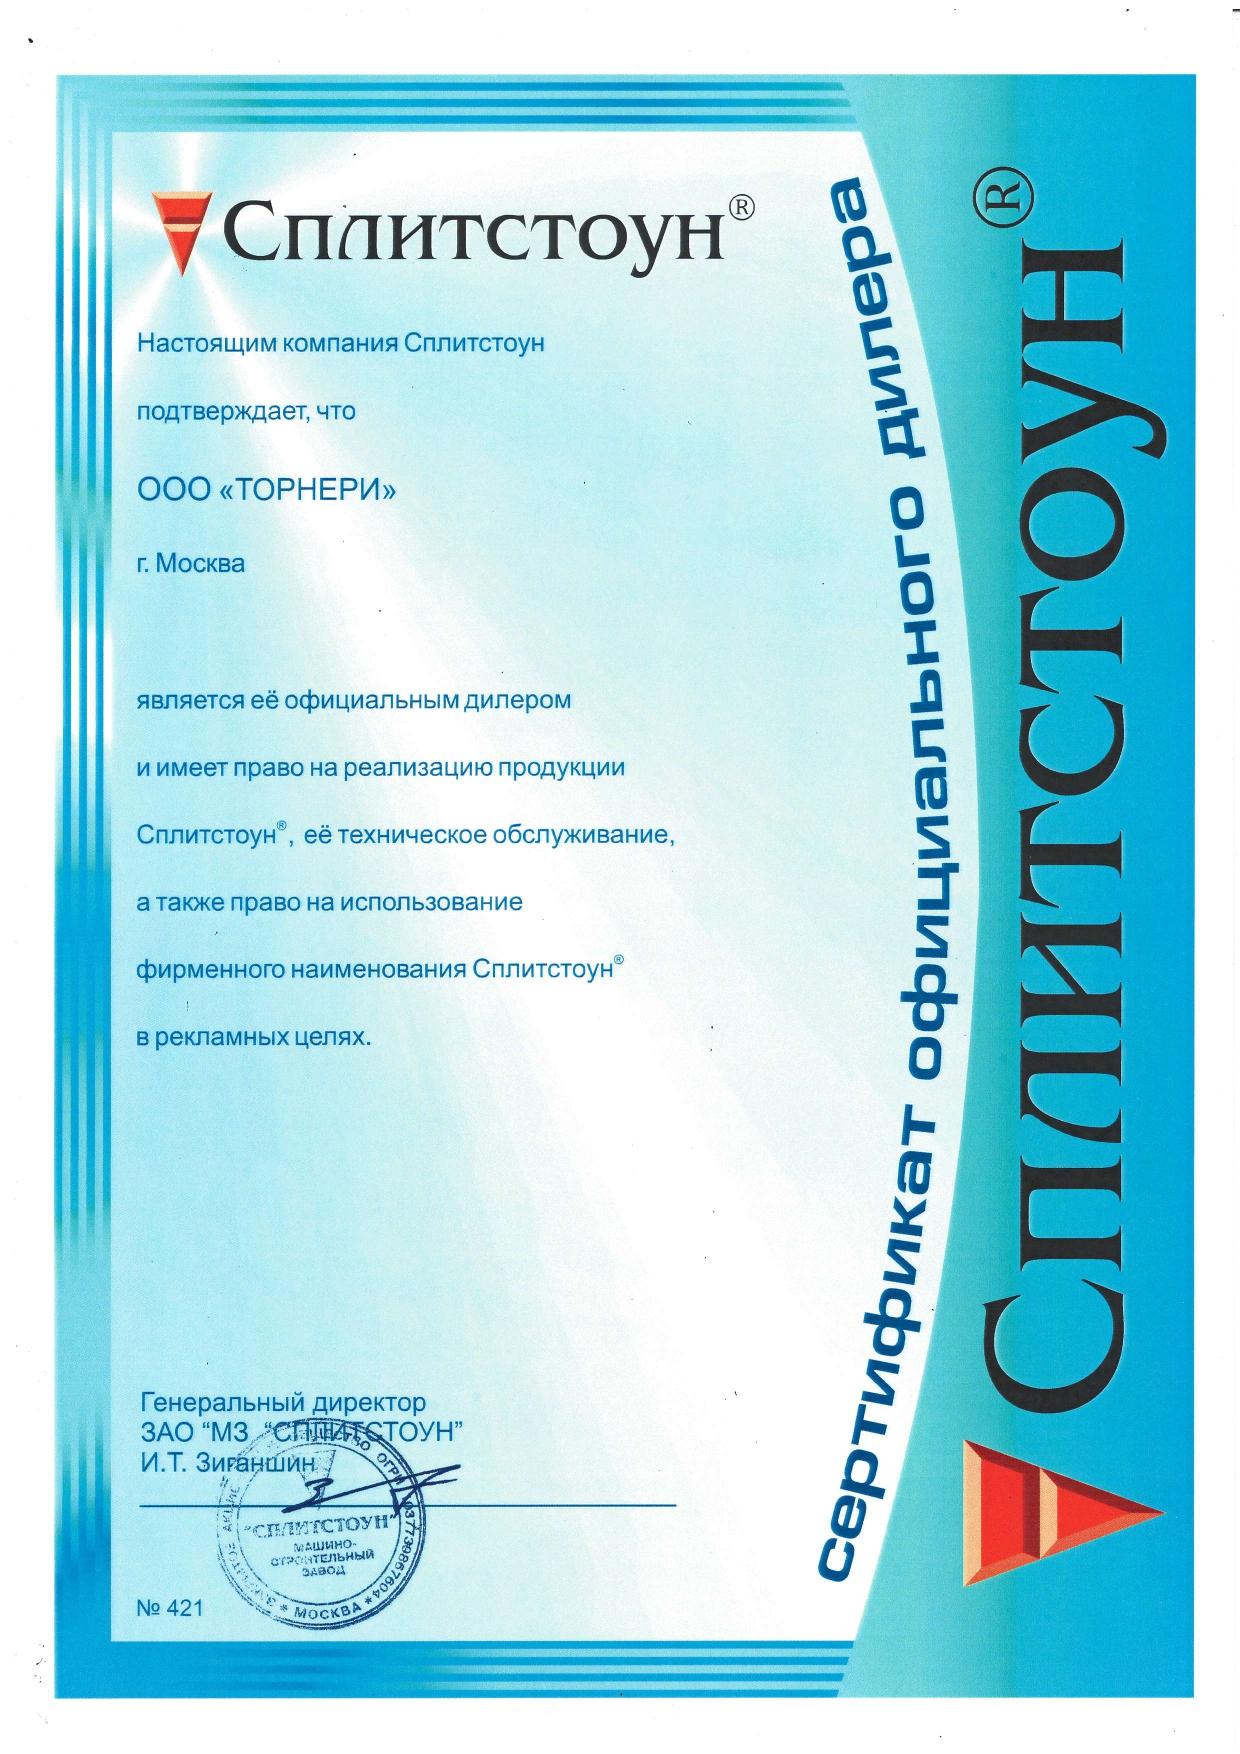 Сертификат дистрибьютора Сплитстоун